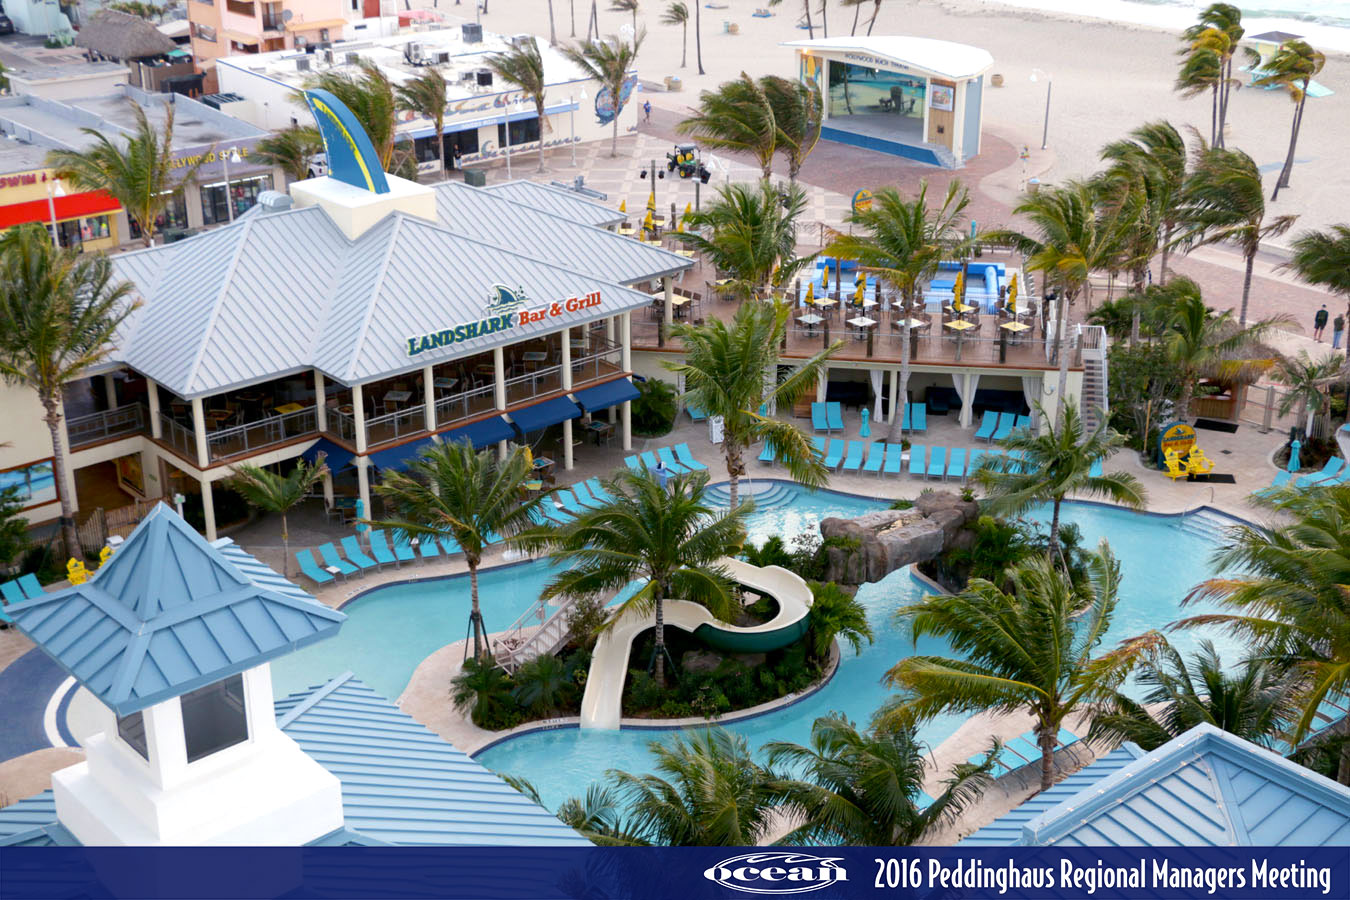 Margaritaville Beach Resort - Hollywood, Florida